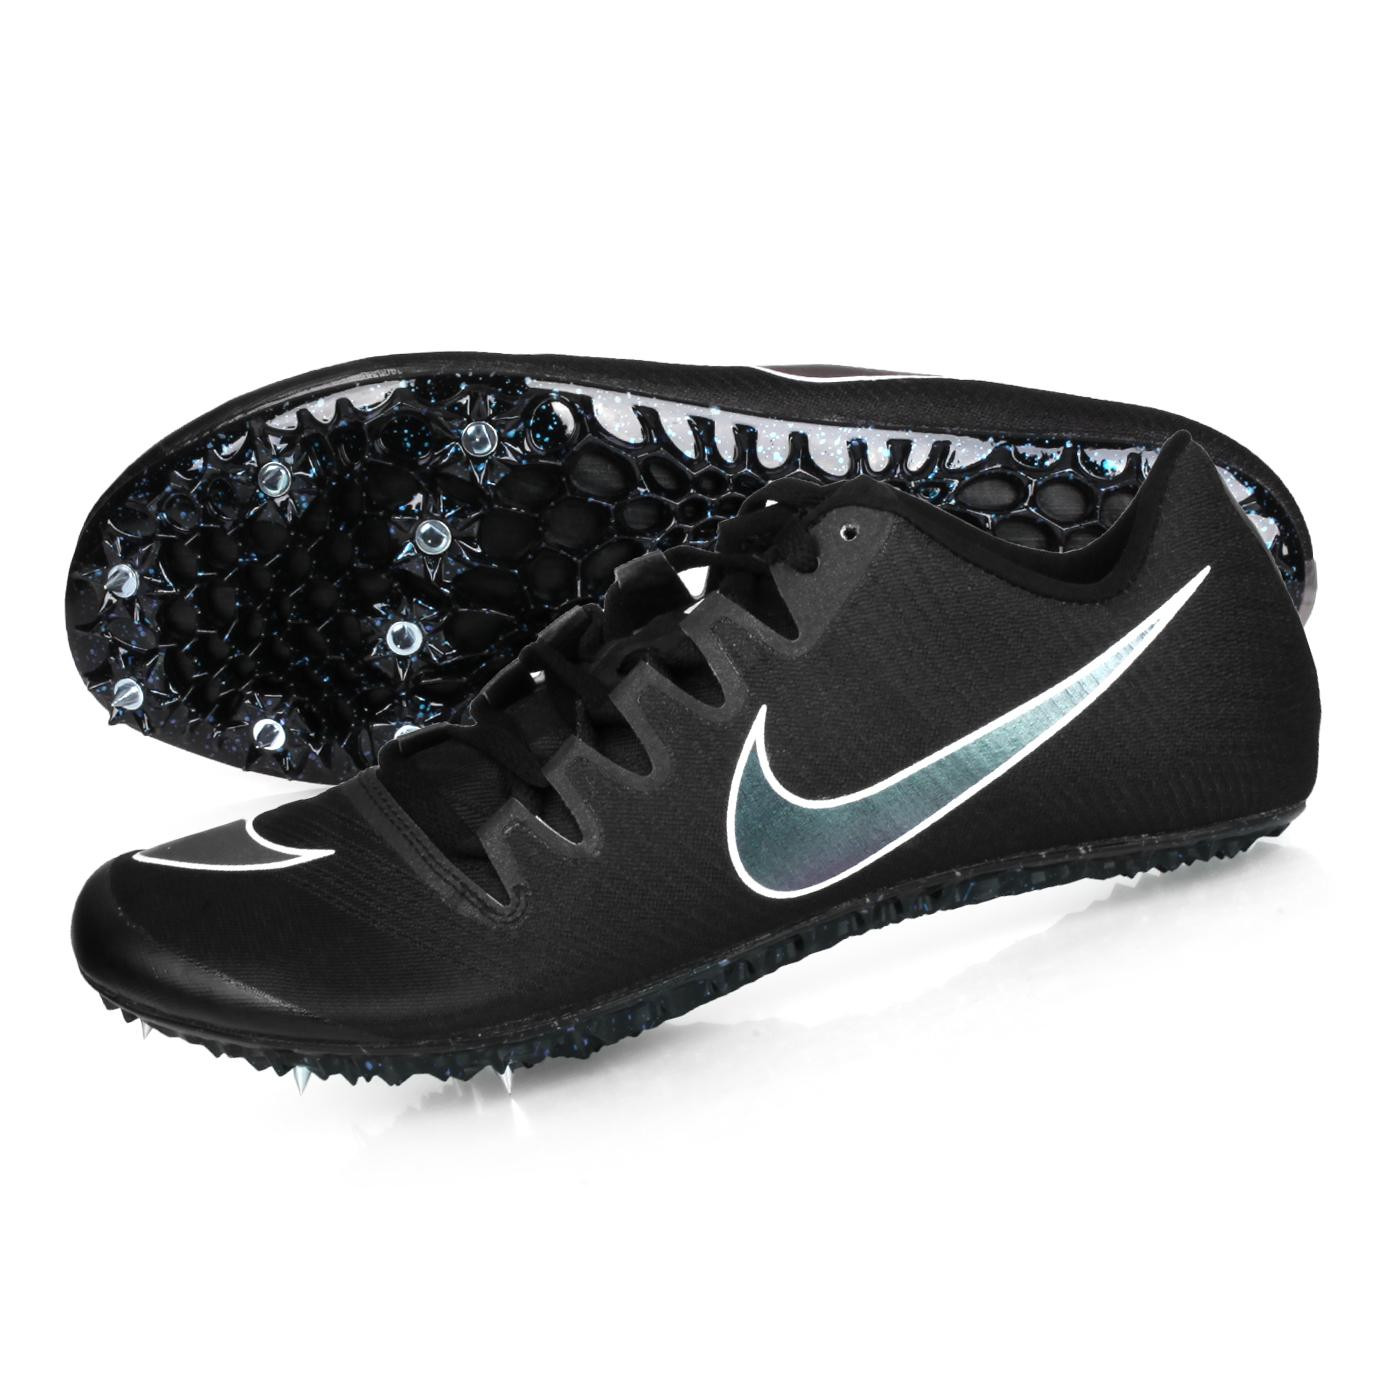 NIKE 田徑釘鞋(短距離)  @ZOOM JA FLY 3@865633002 - 黑黑白